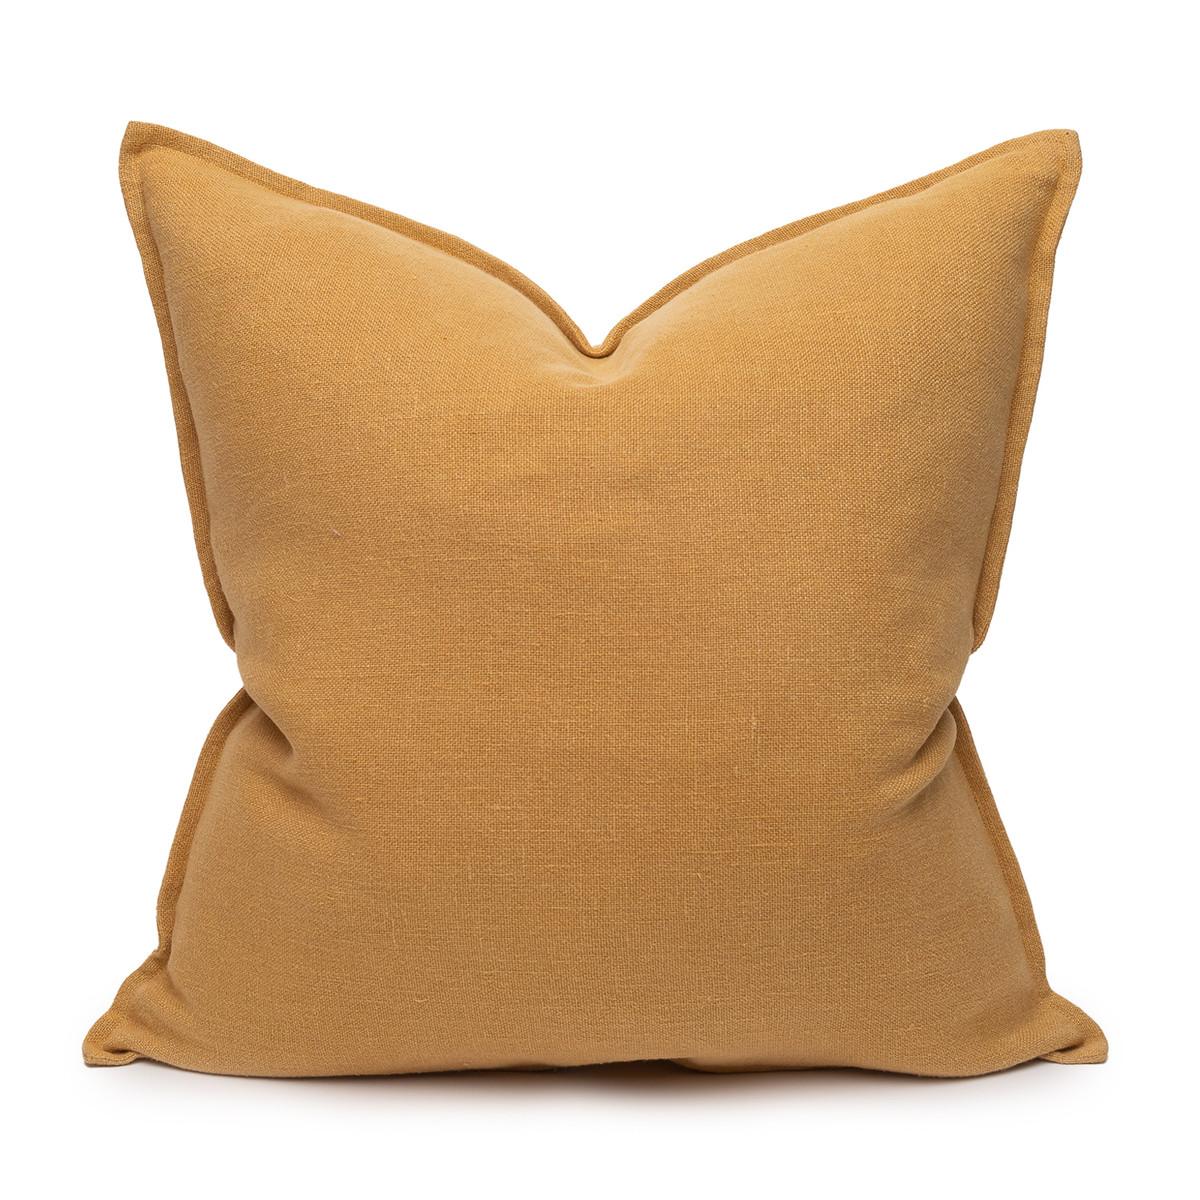 Simone PURE LINEN Pillow Dijon Mustard- 22 - Front